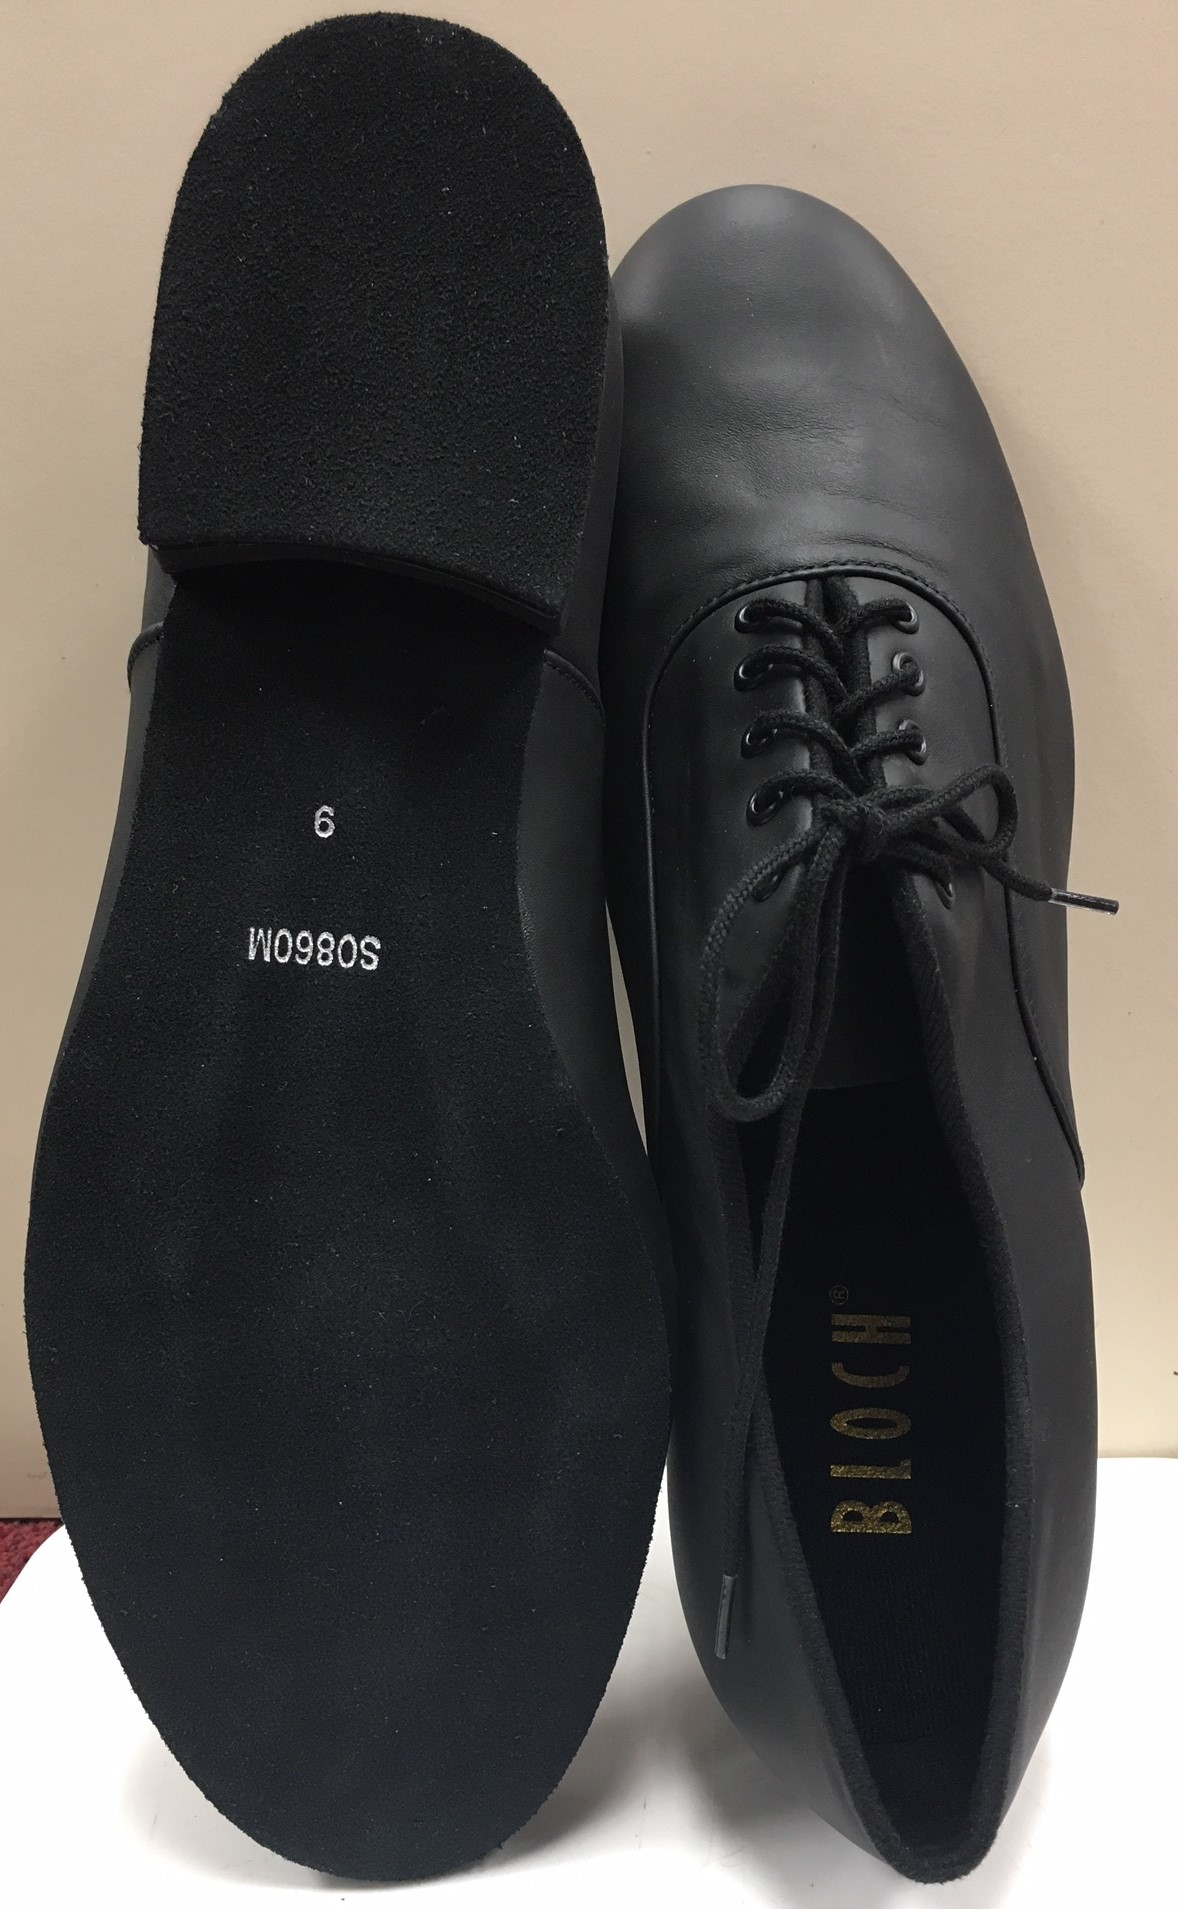 Bloch Men's 1 Inch Heel Suede Sole Leather Upper Xavier Oxford Ballroom Shoes